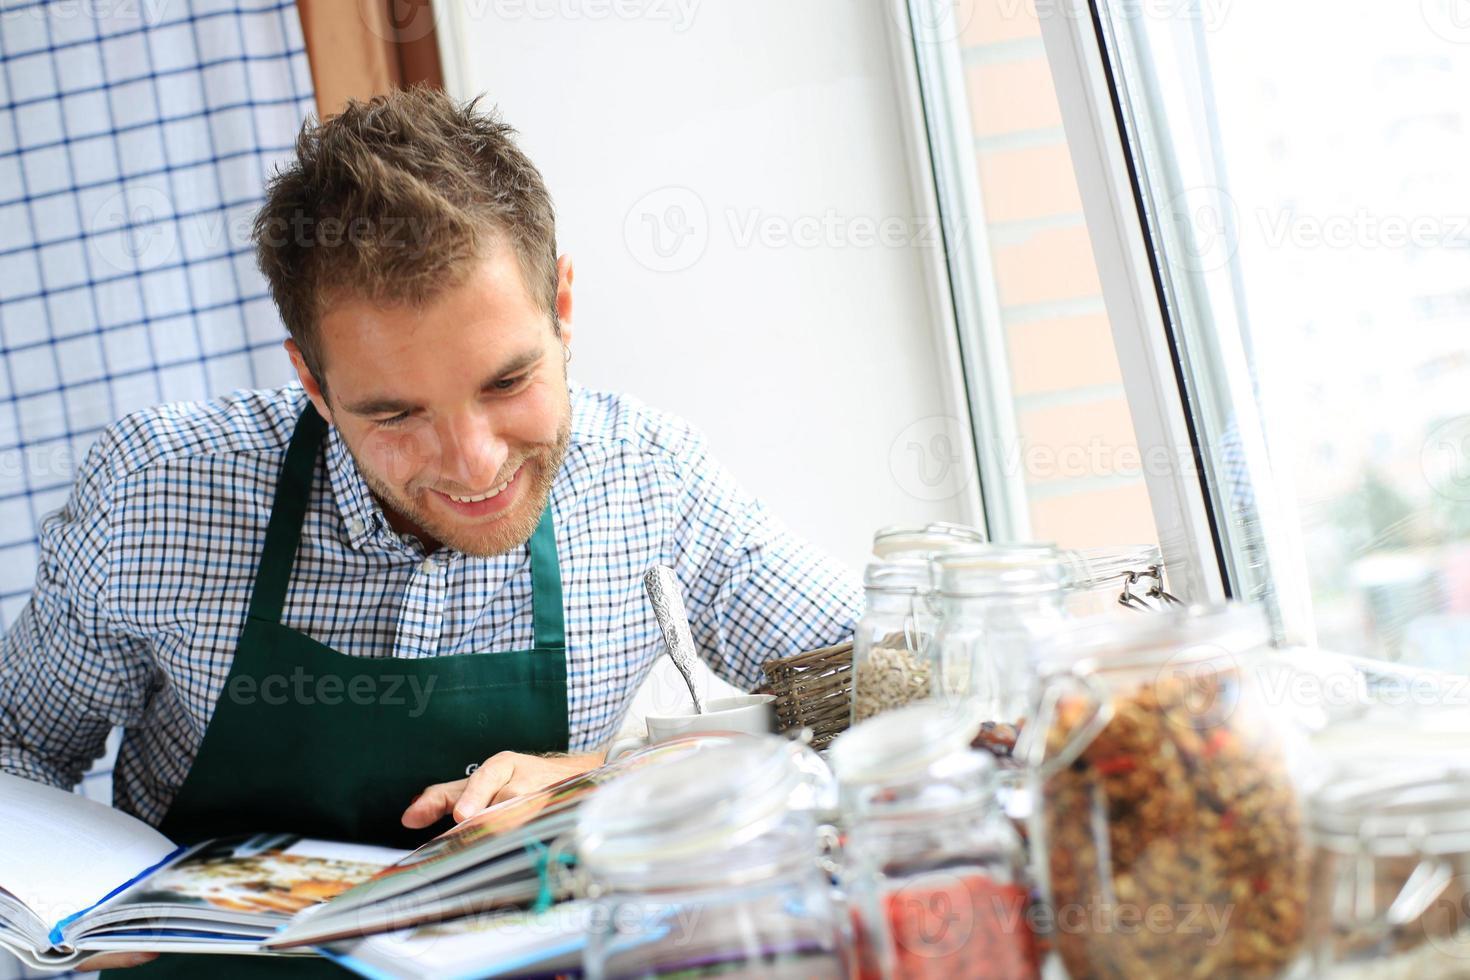 kille matlagning foto